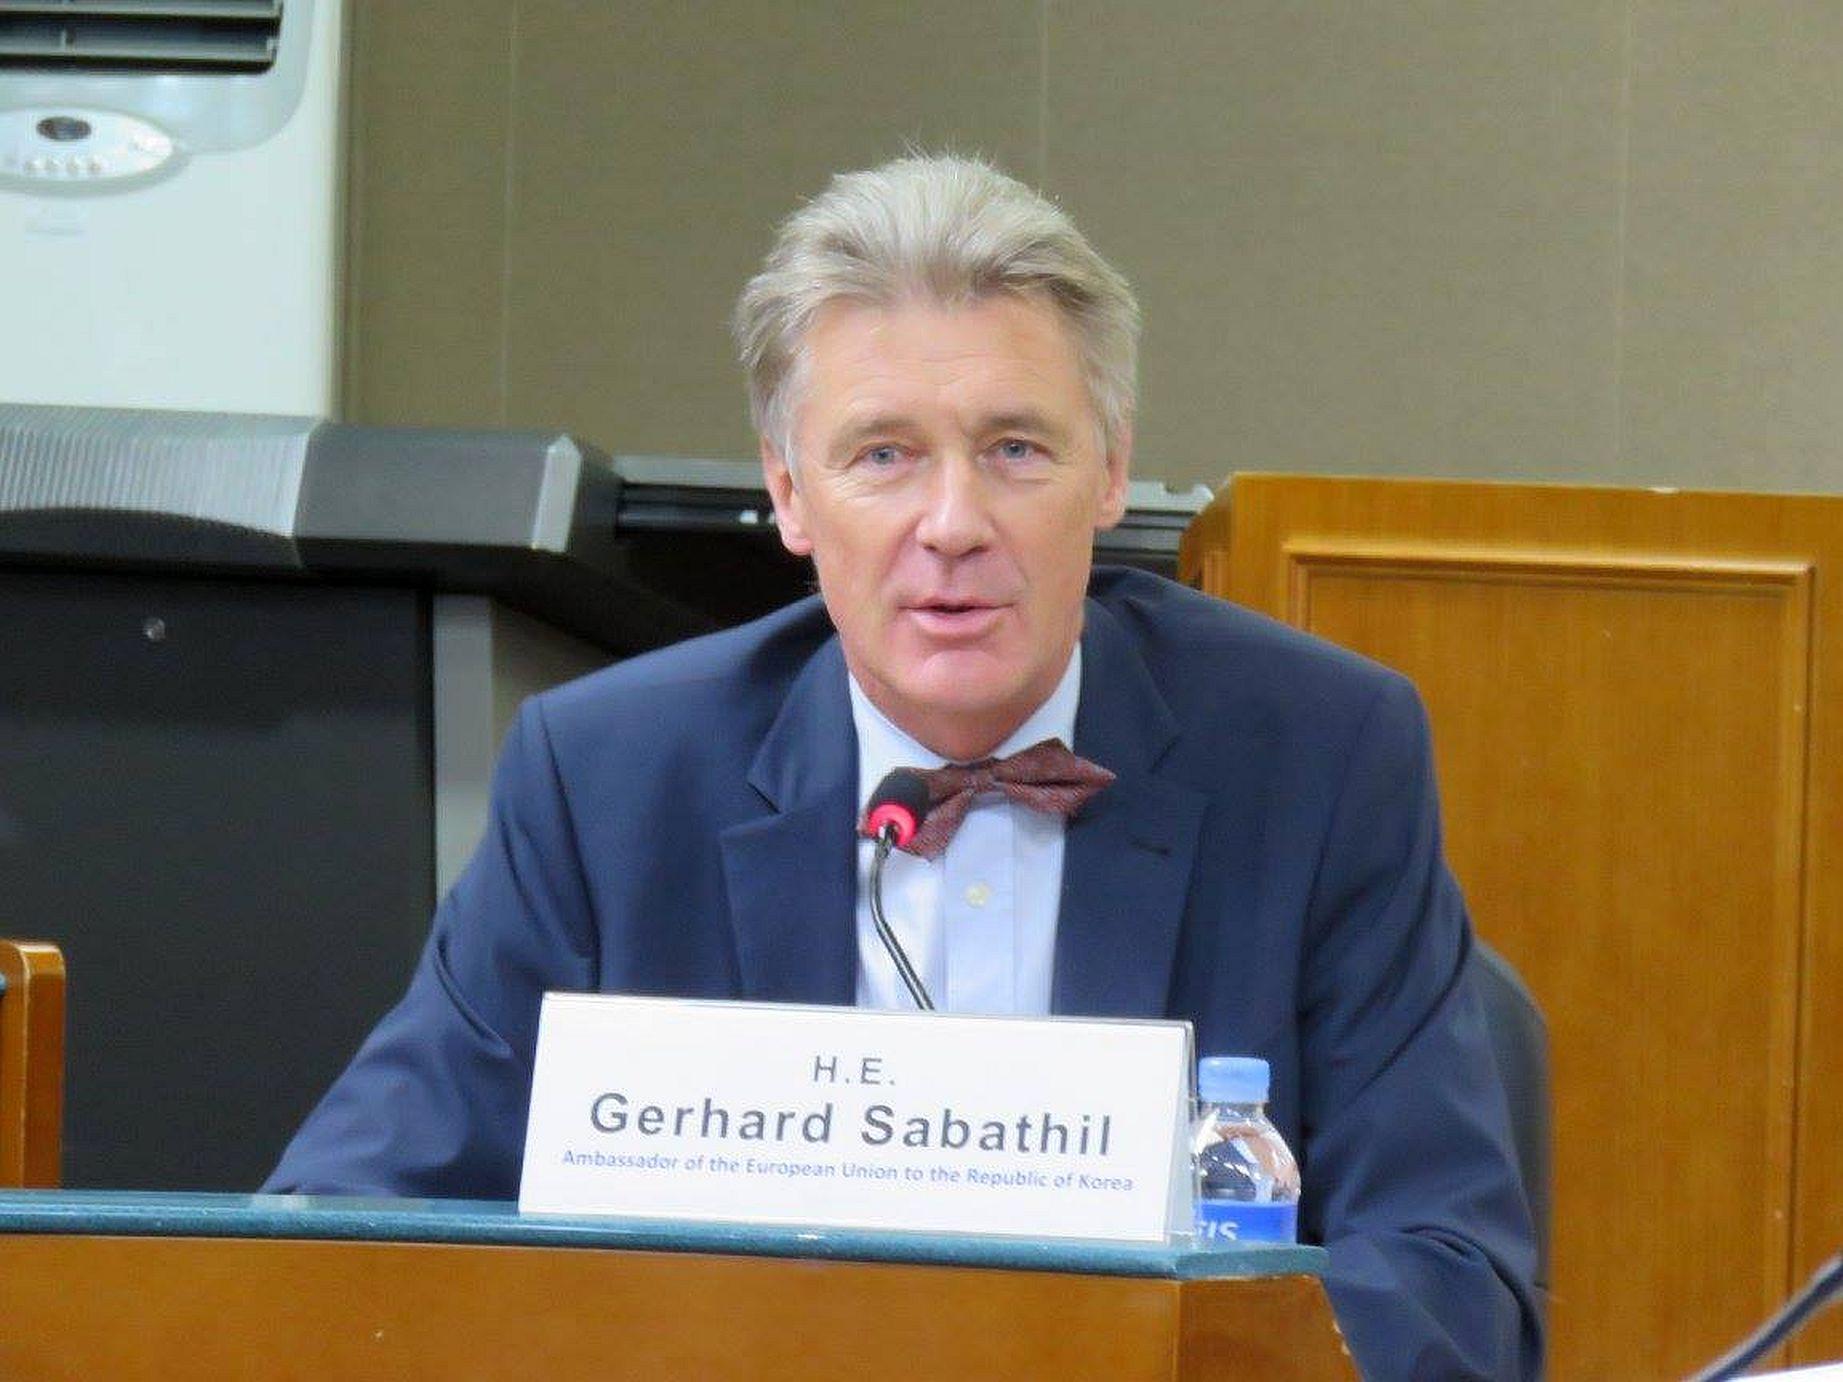 l'ancien diplomate de l'UE Gerhard Sabathil